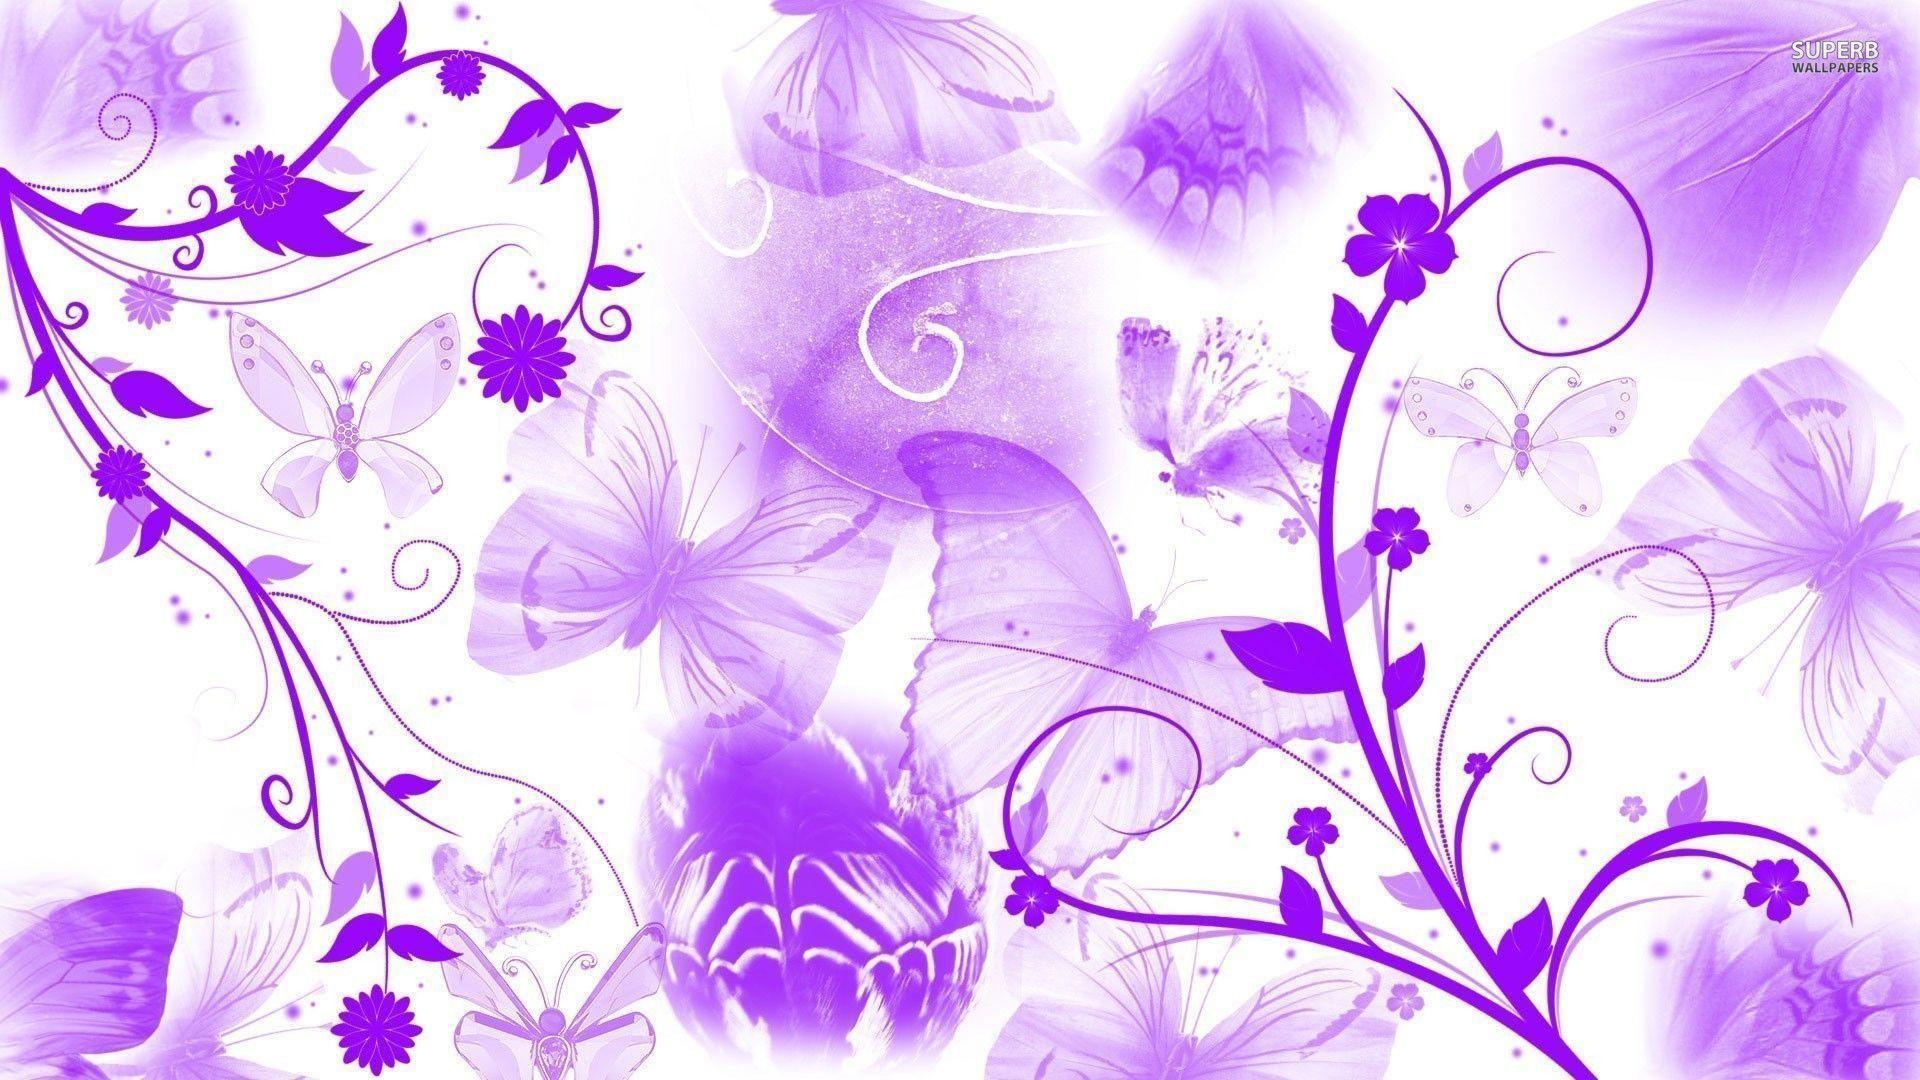 Purple And White Picture